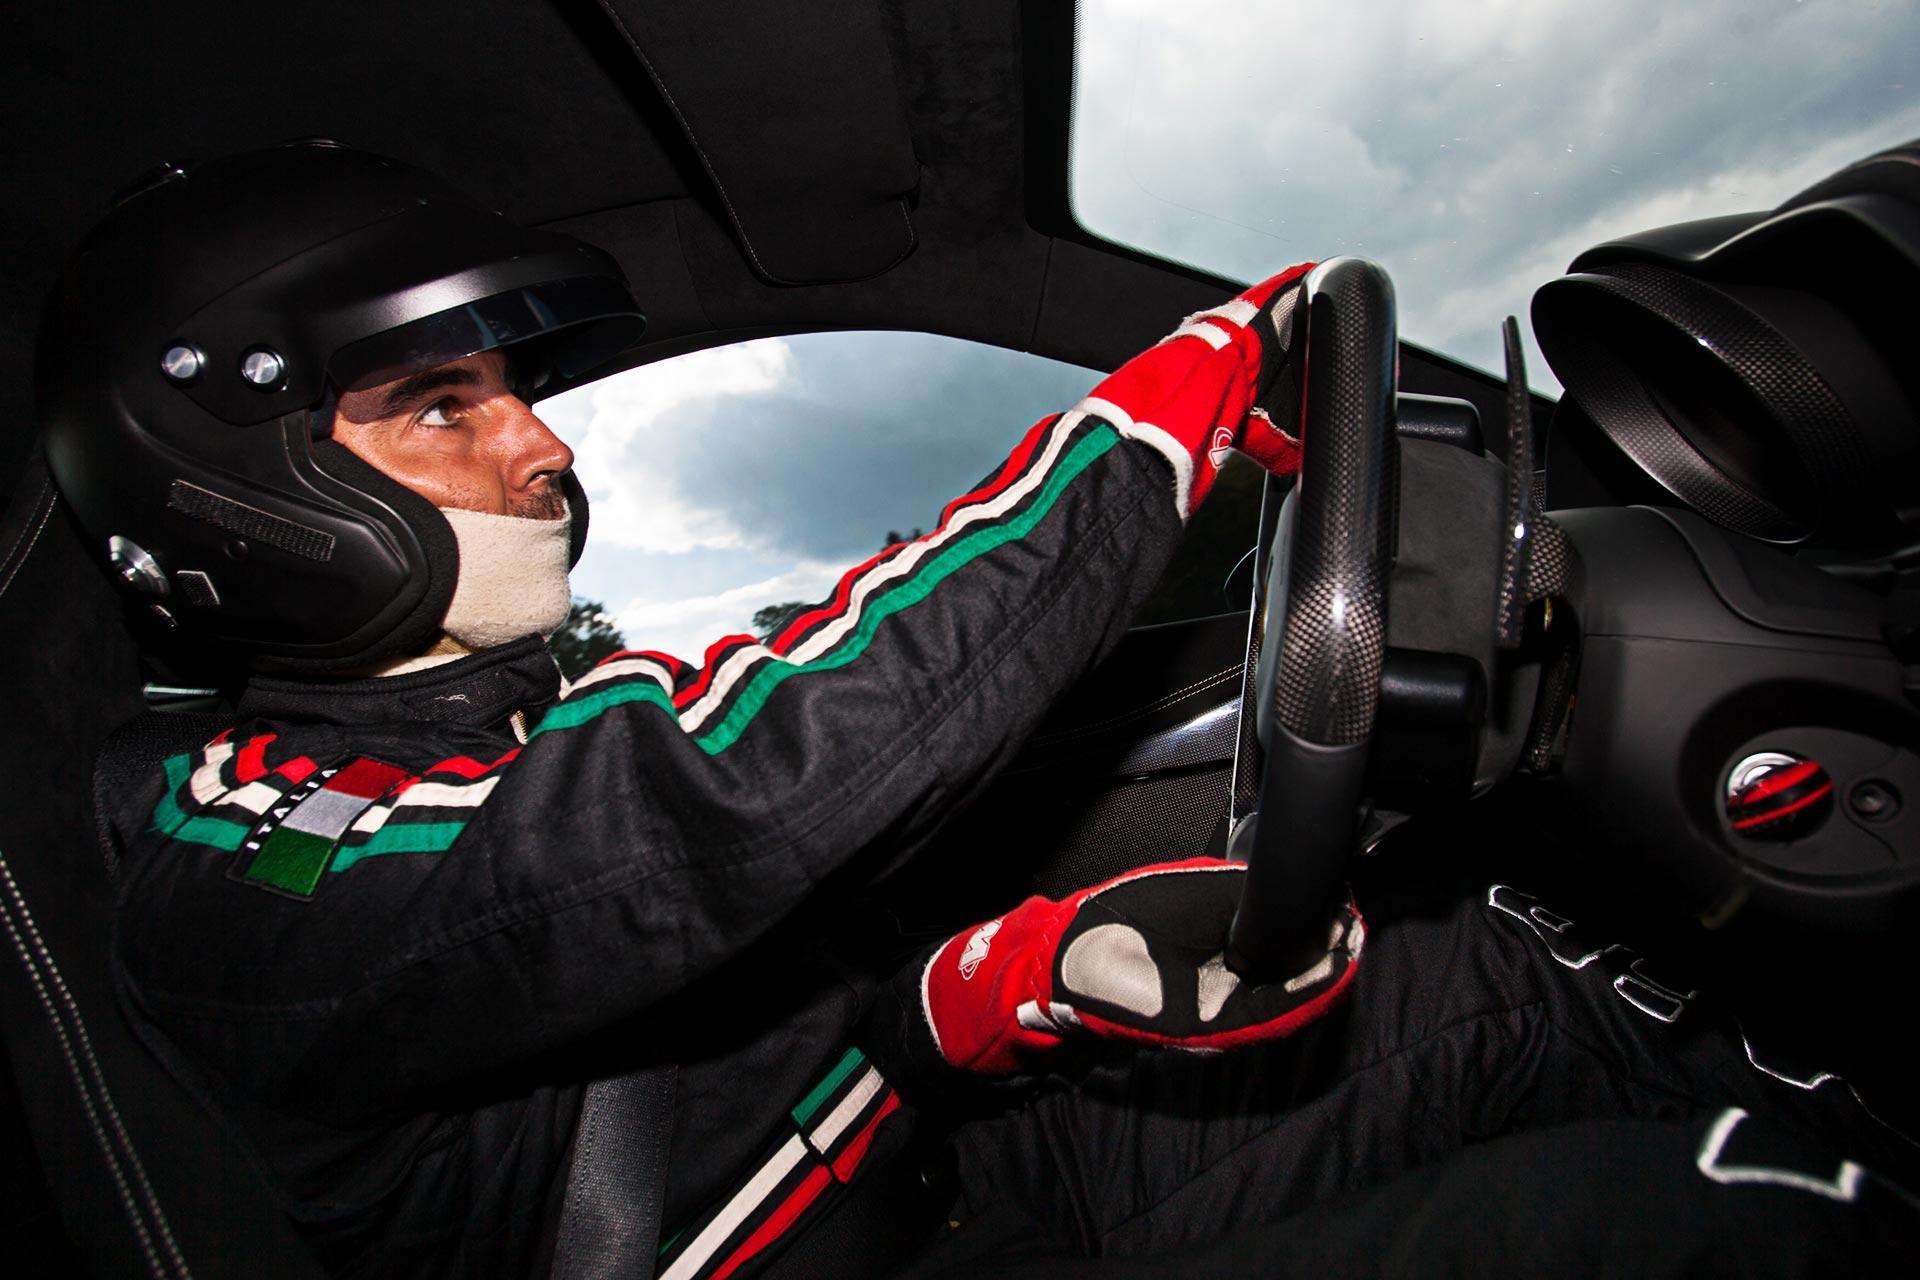 autoropa-racing-days-001